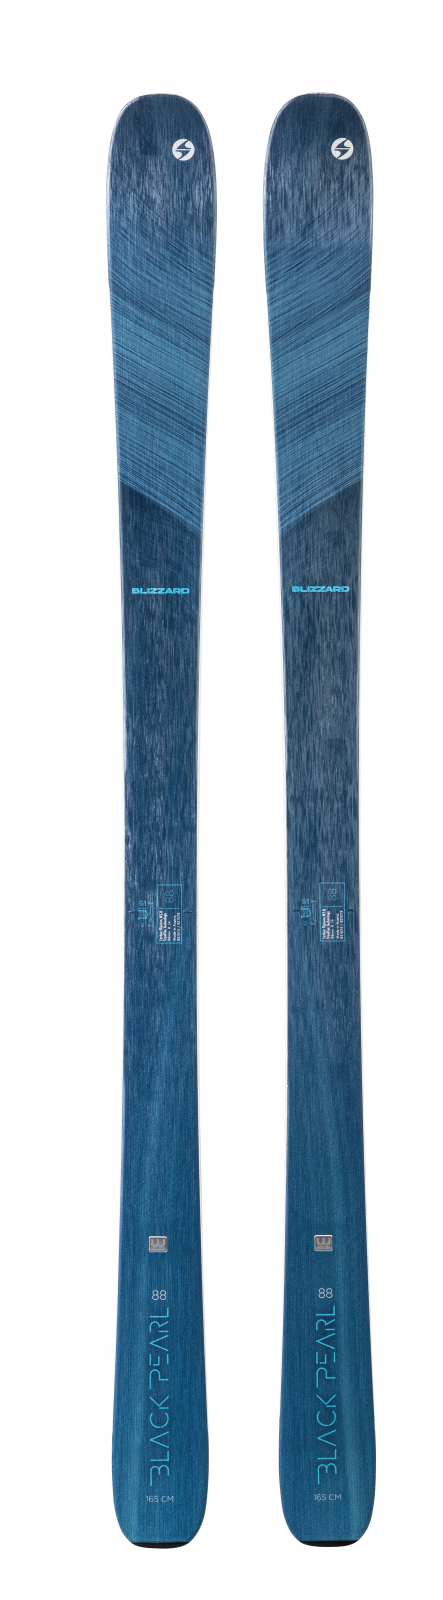 2021 Blizzard Black Pearl 88 Women's Skis